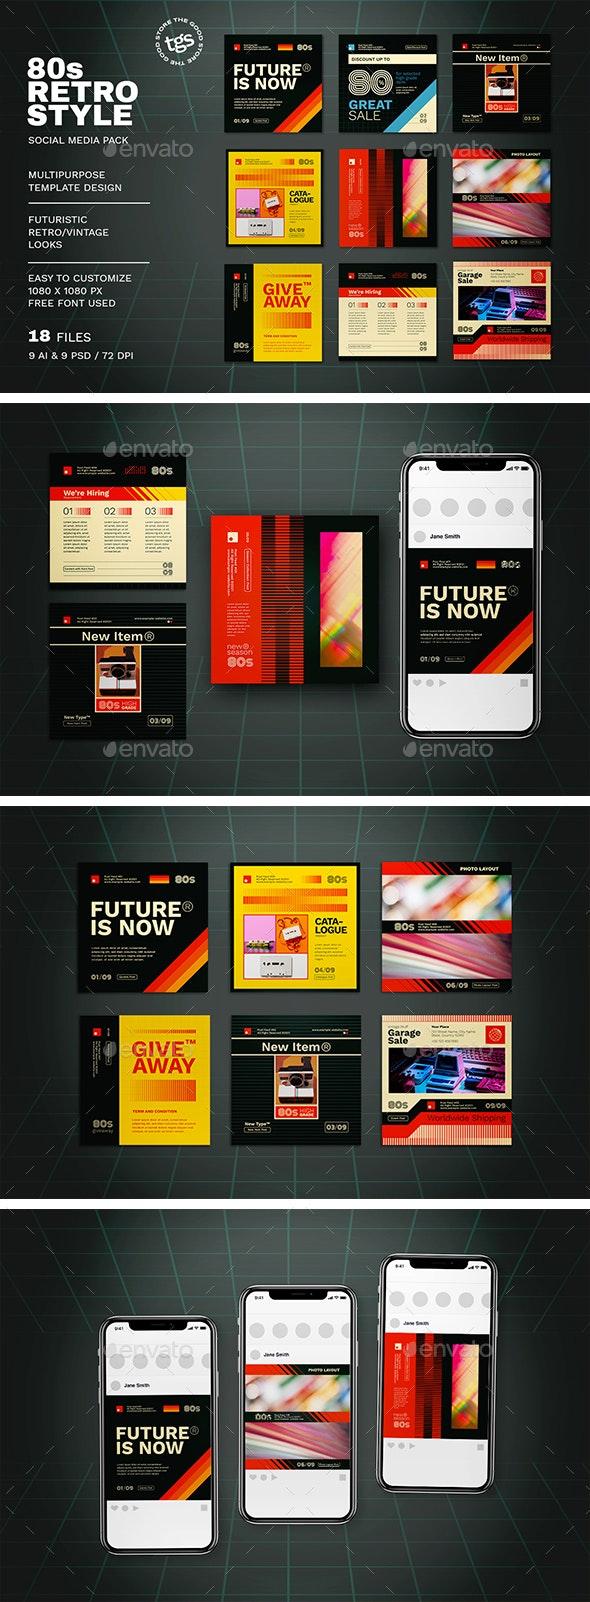 80s Retro Style Social Media Pack - Social Media Web Elements